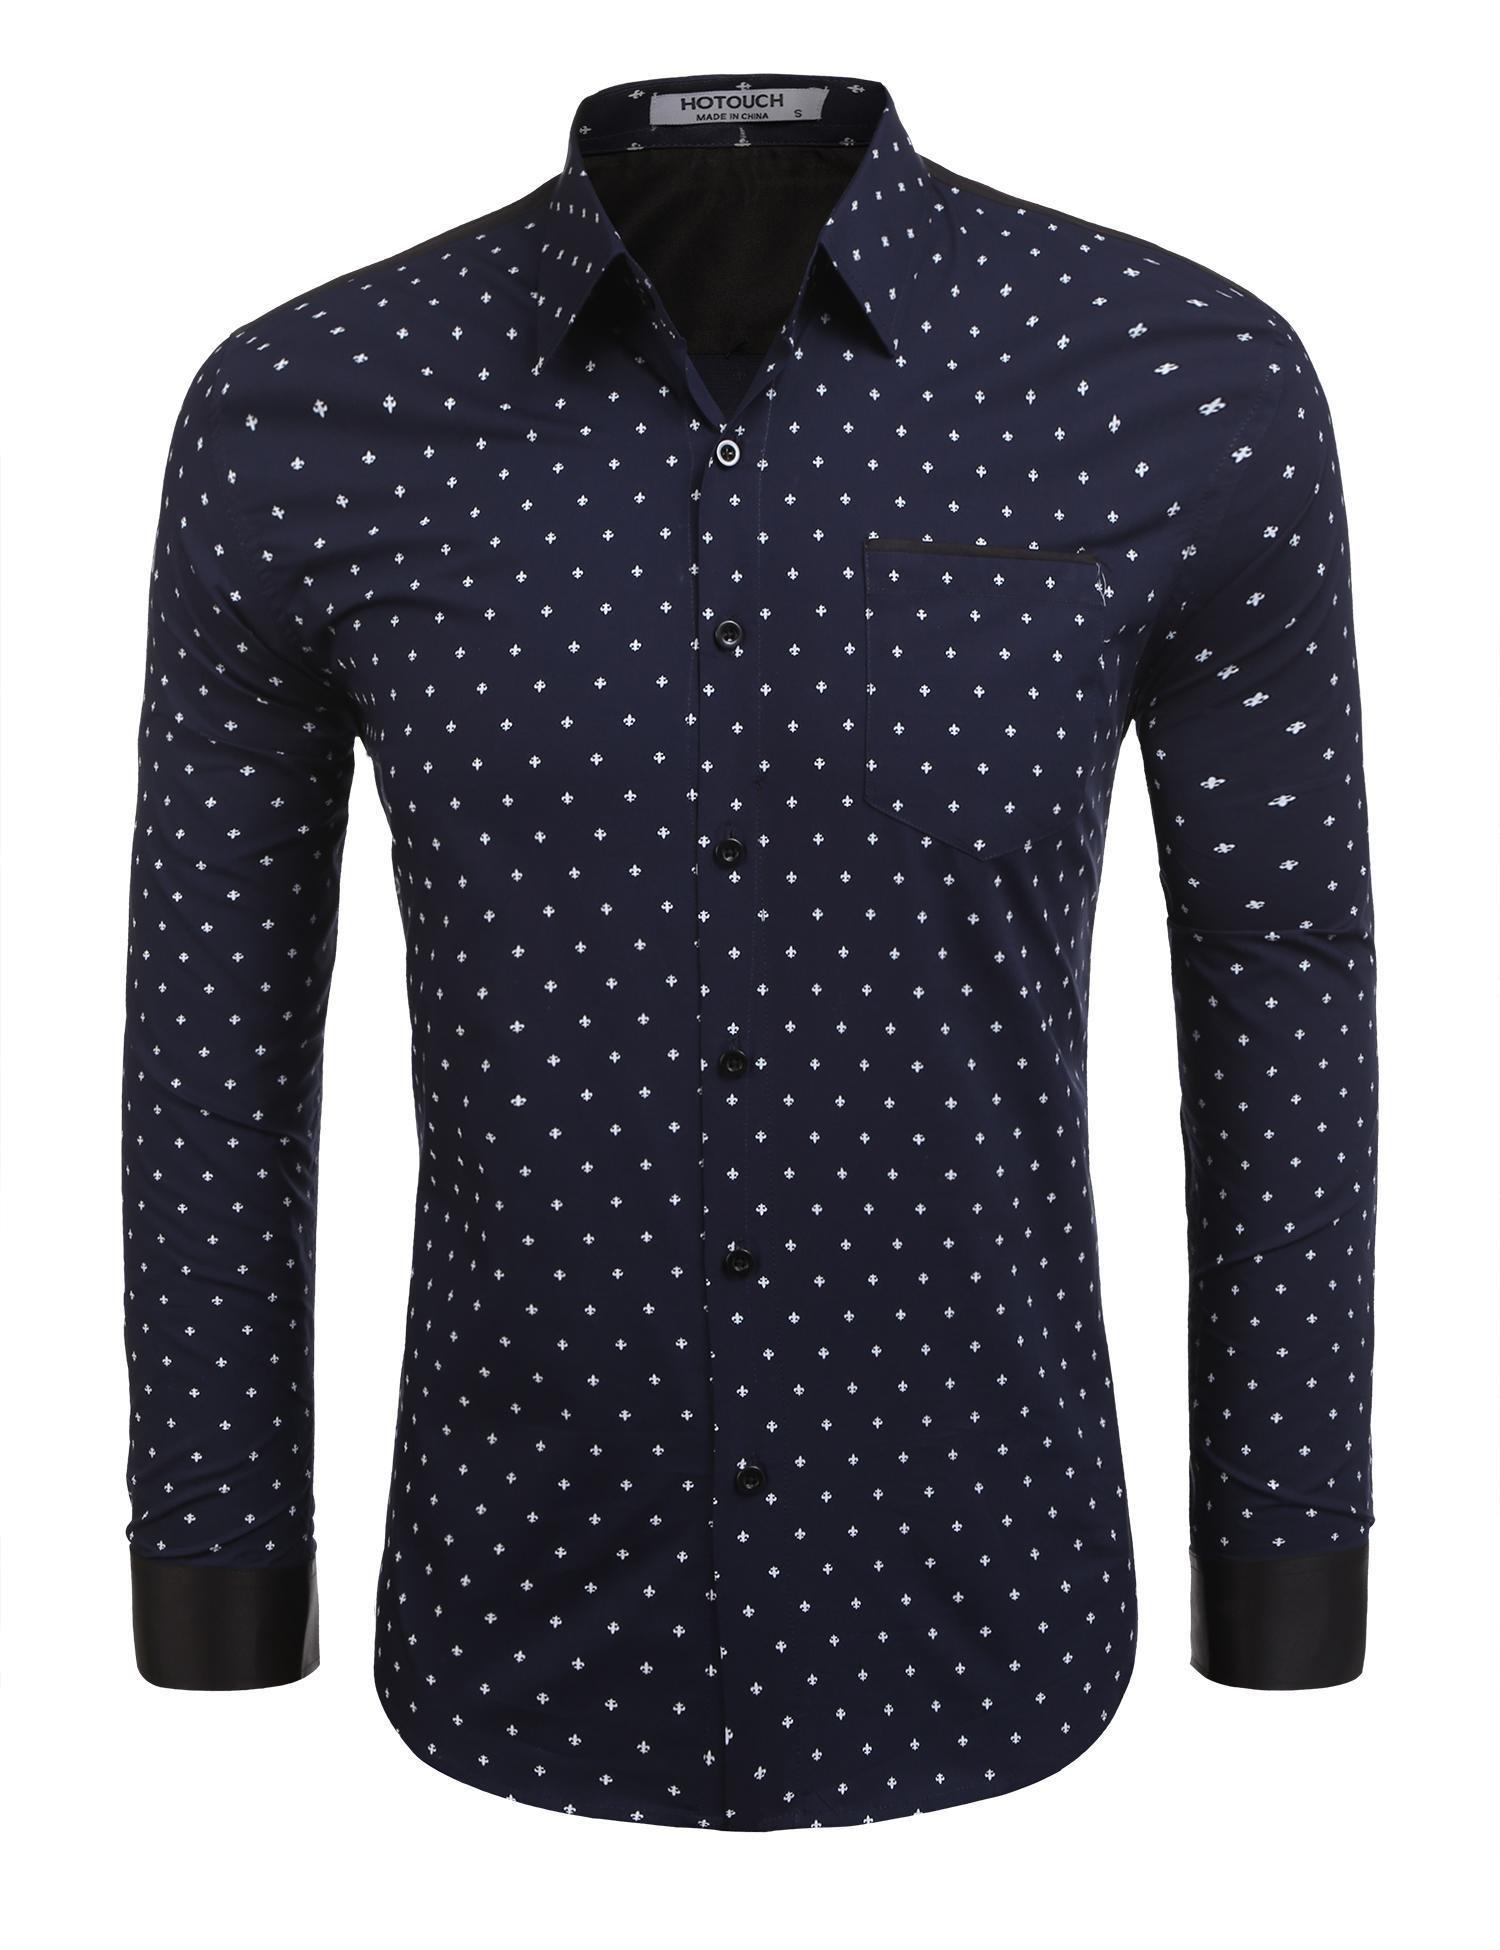 HOTOUCH Men's Summer Printed Dress Long Sleeve Shirts With Pocket,Navy Blue,Medium